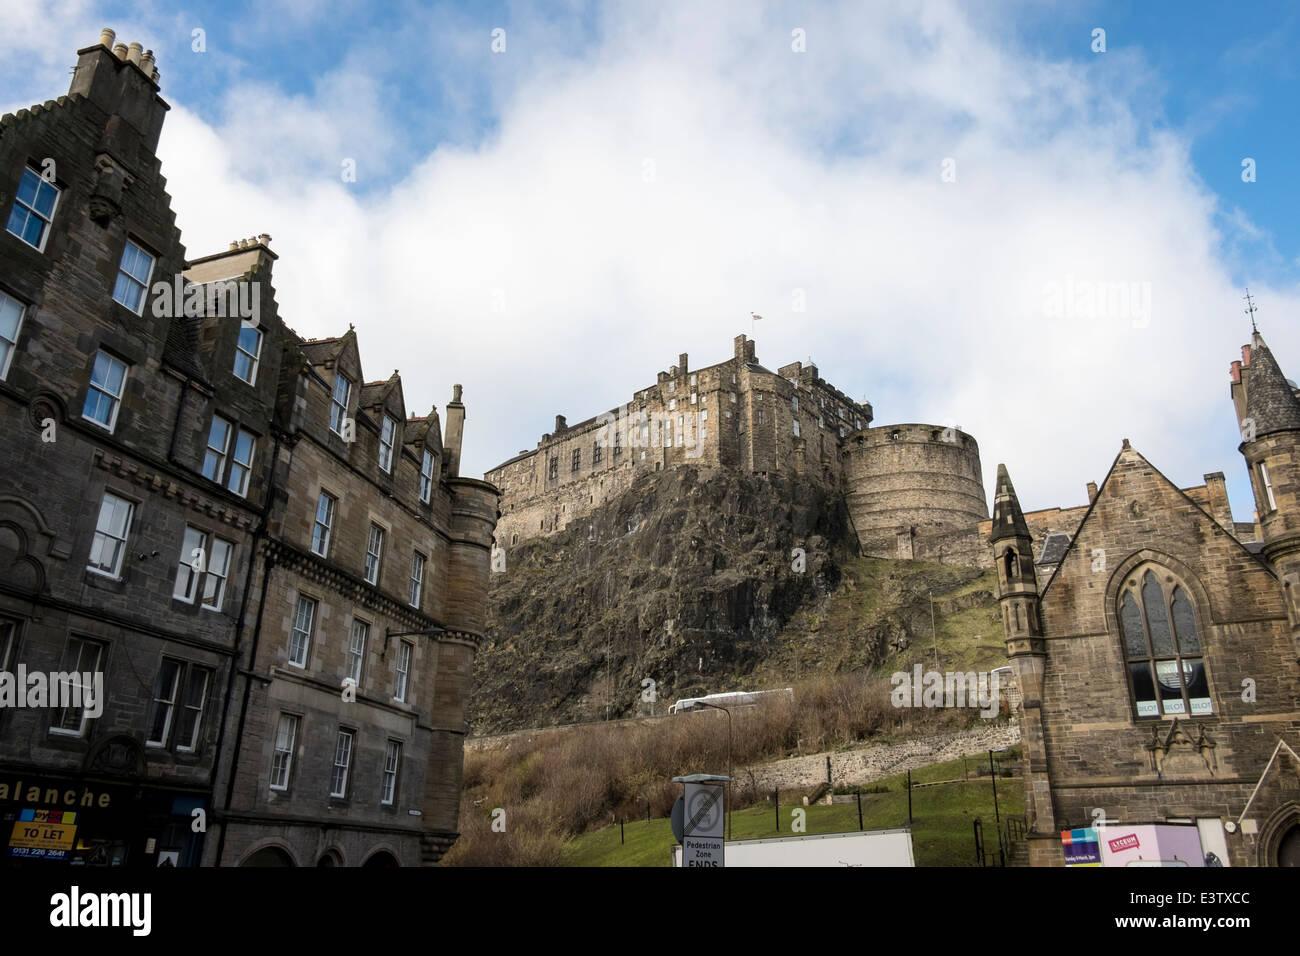 Edinburgh's castle view from Grassmarket square. - Stock Image